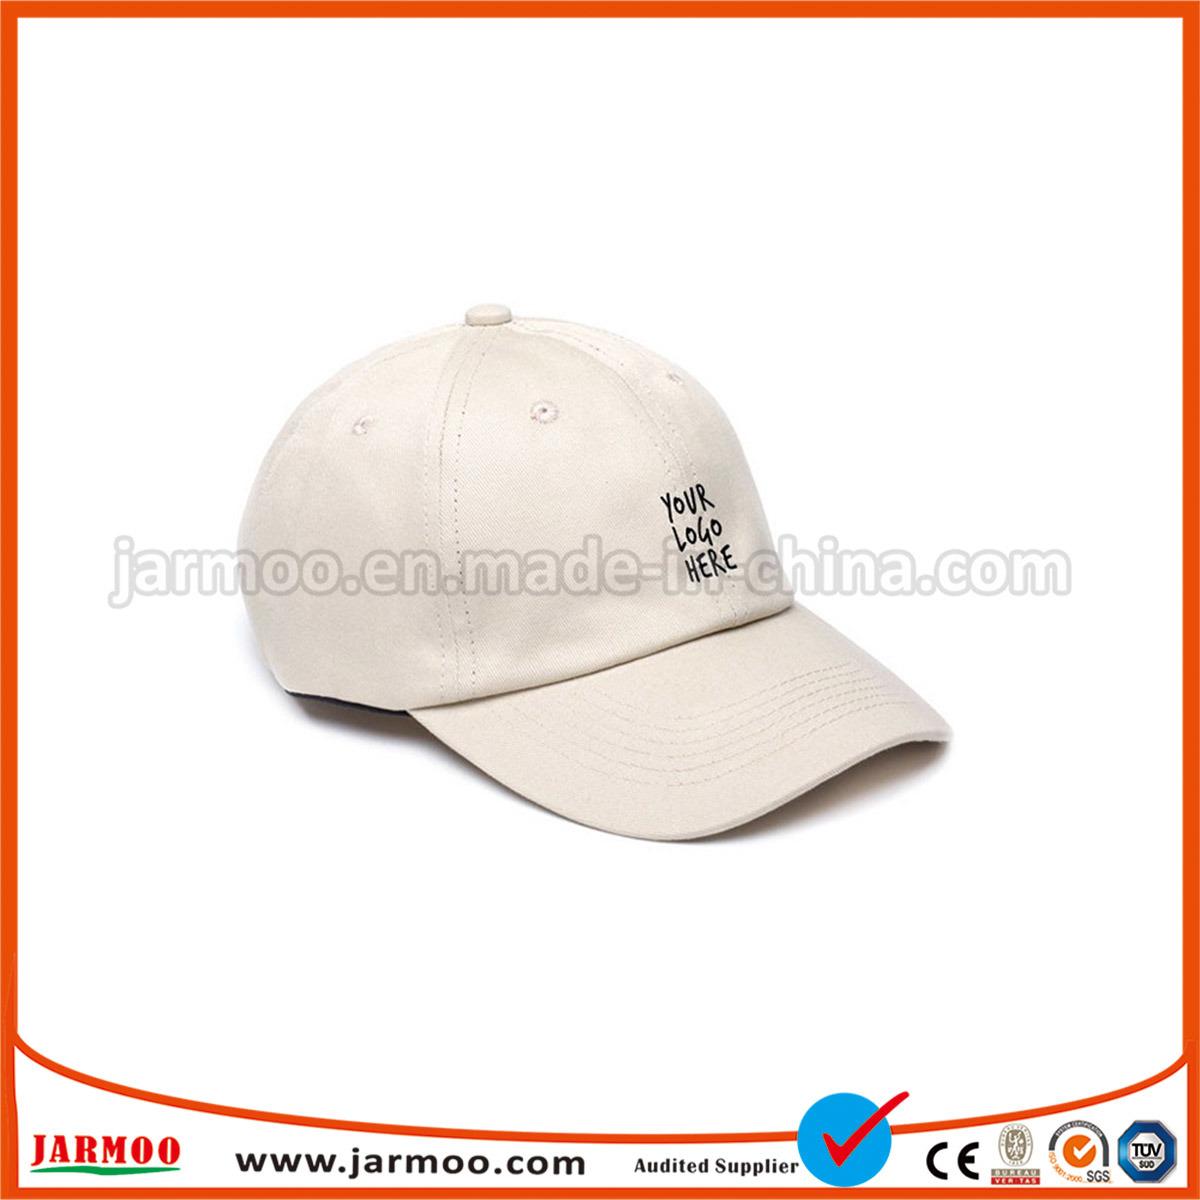 c1830cb2213 China Custom Football Club Sports Hats with Embroidery Logo Photos ...